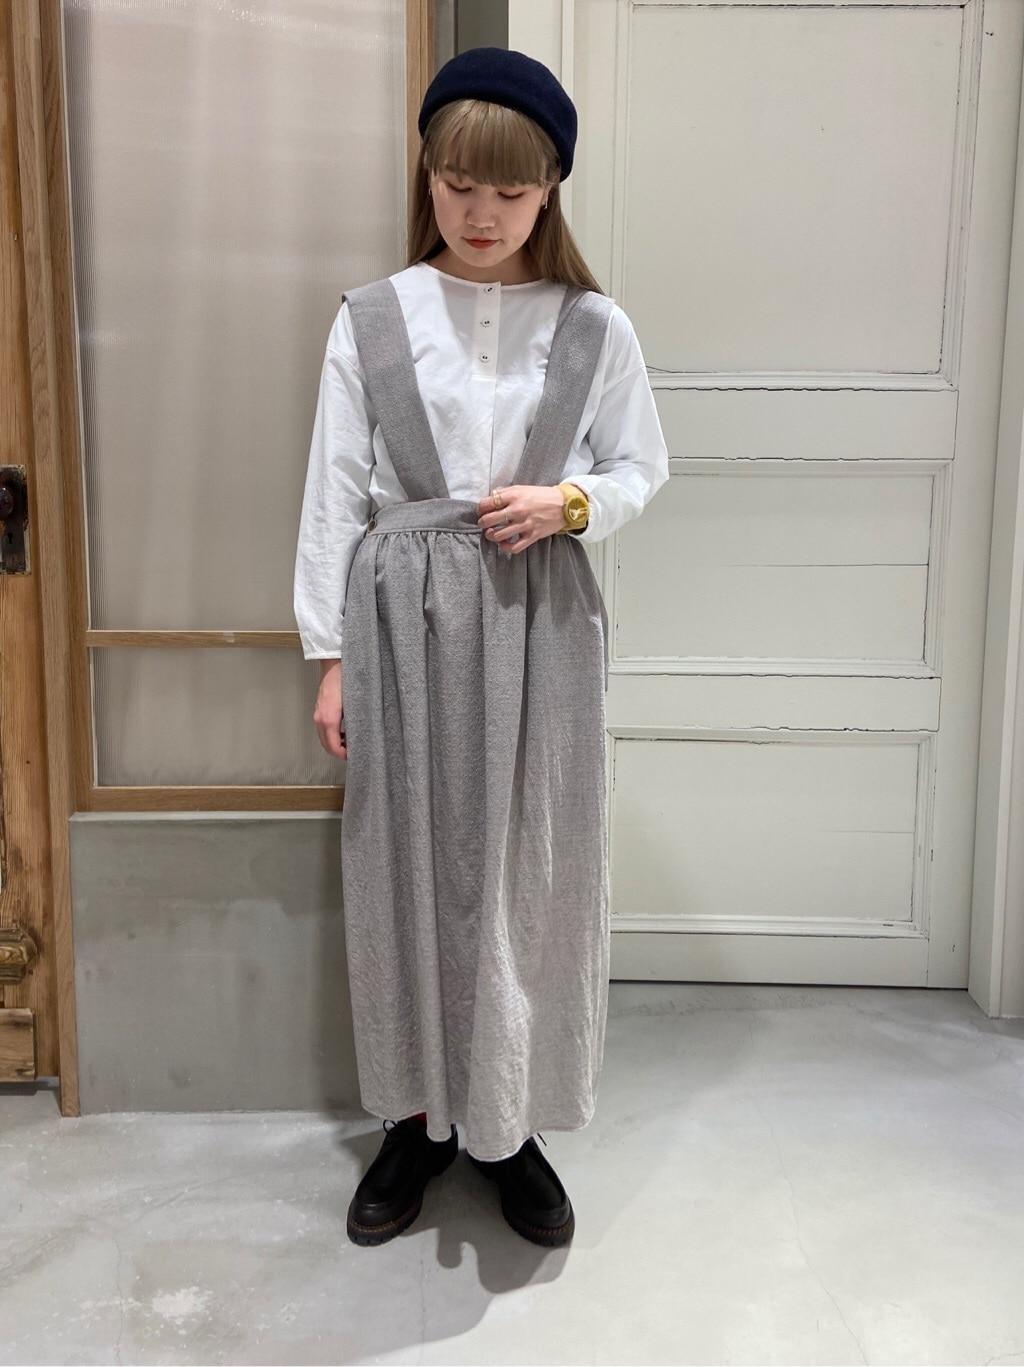 bulle de savon 渋谷スクランブルスクエア 身長:160cm 2020.12.15